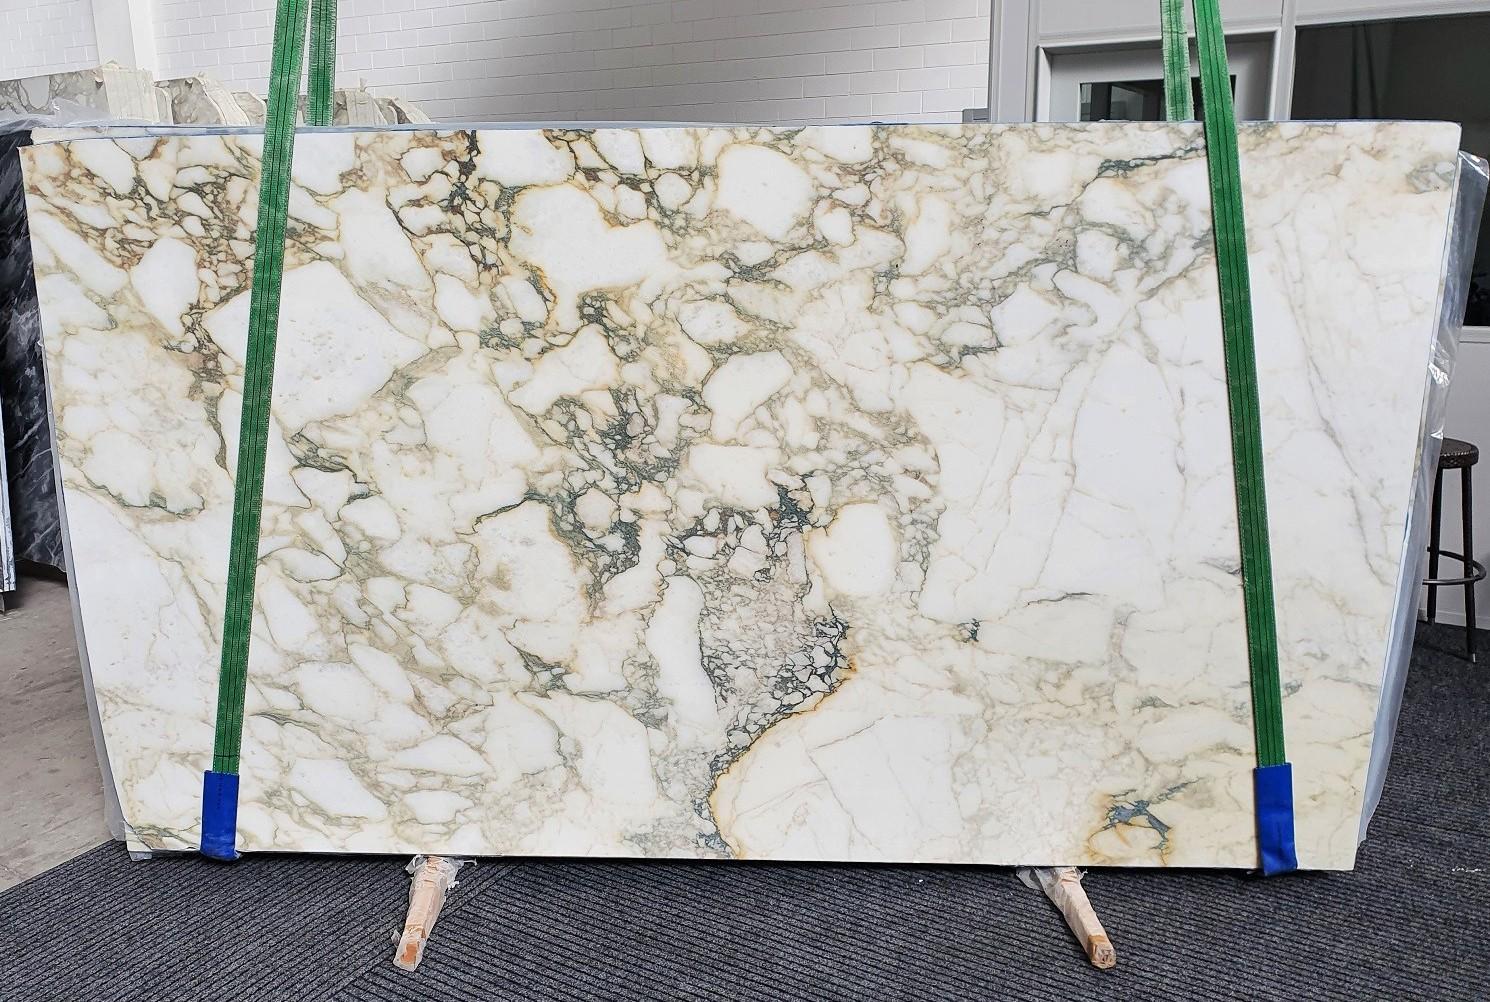 PAONAZZO VAGLI Supply Veneto (Italy) polished slabs 1363 , Slab #41 natural marble